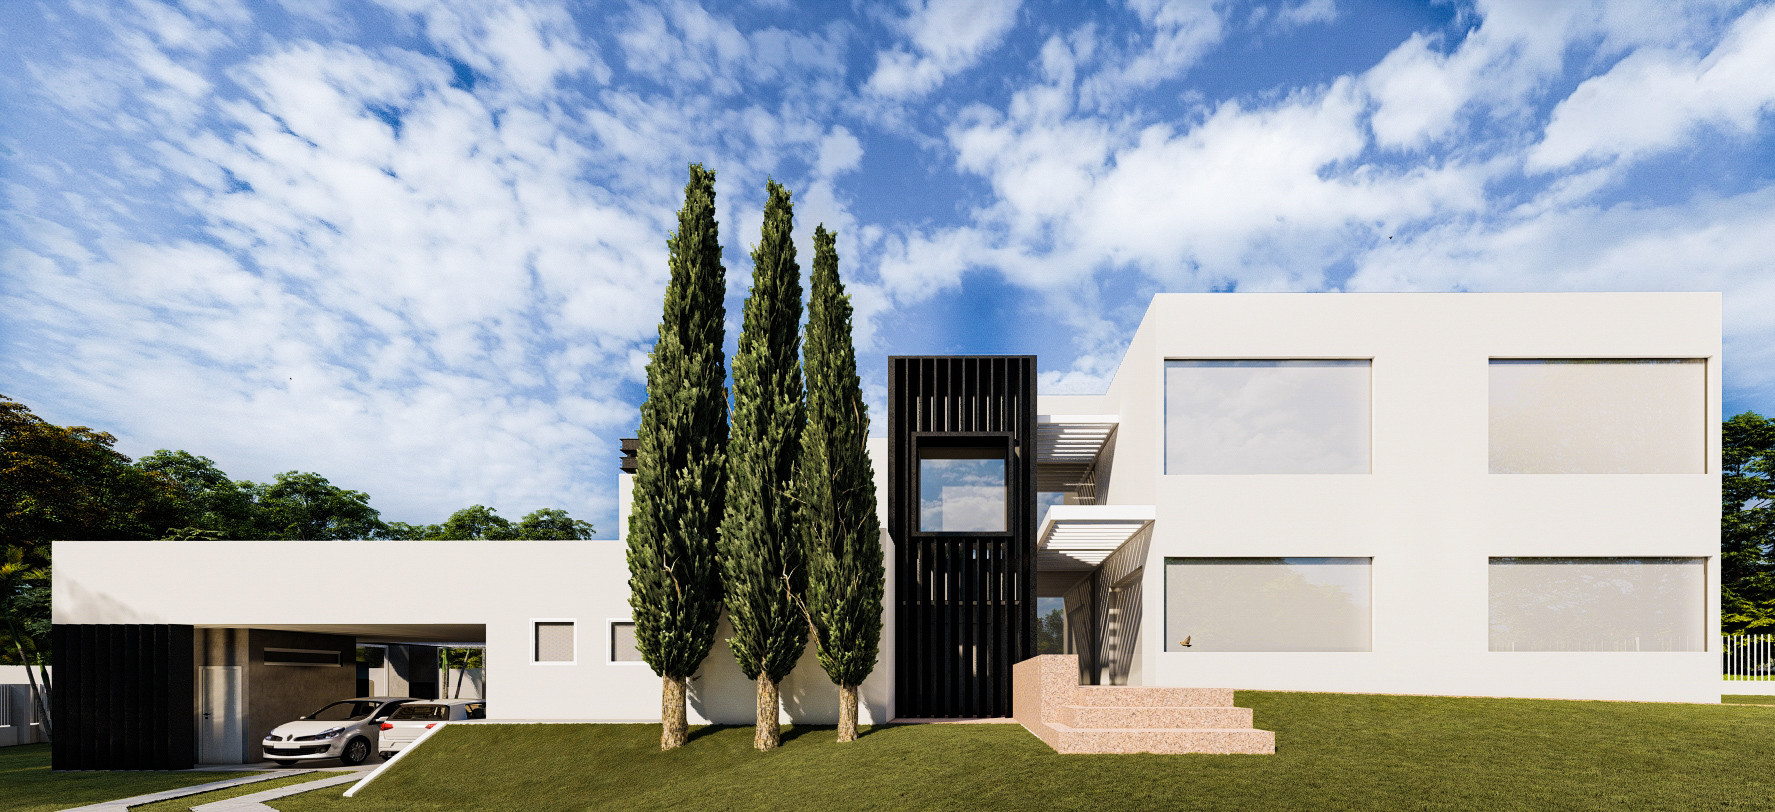 leve_casa novak - numen arquitetura (23)